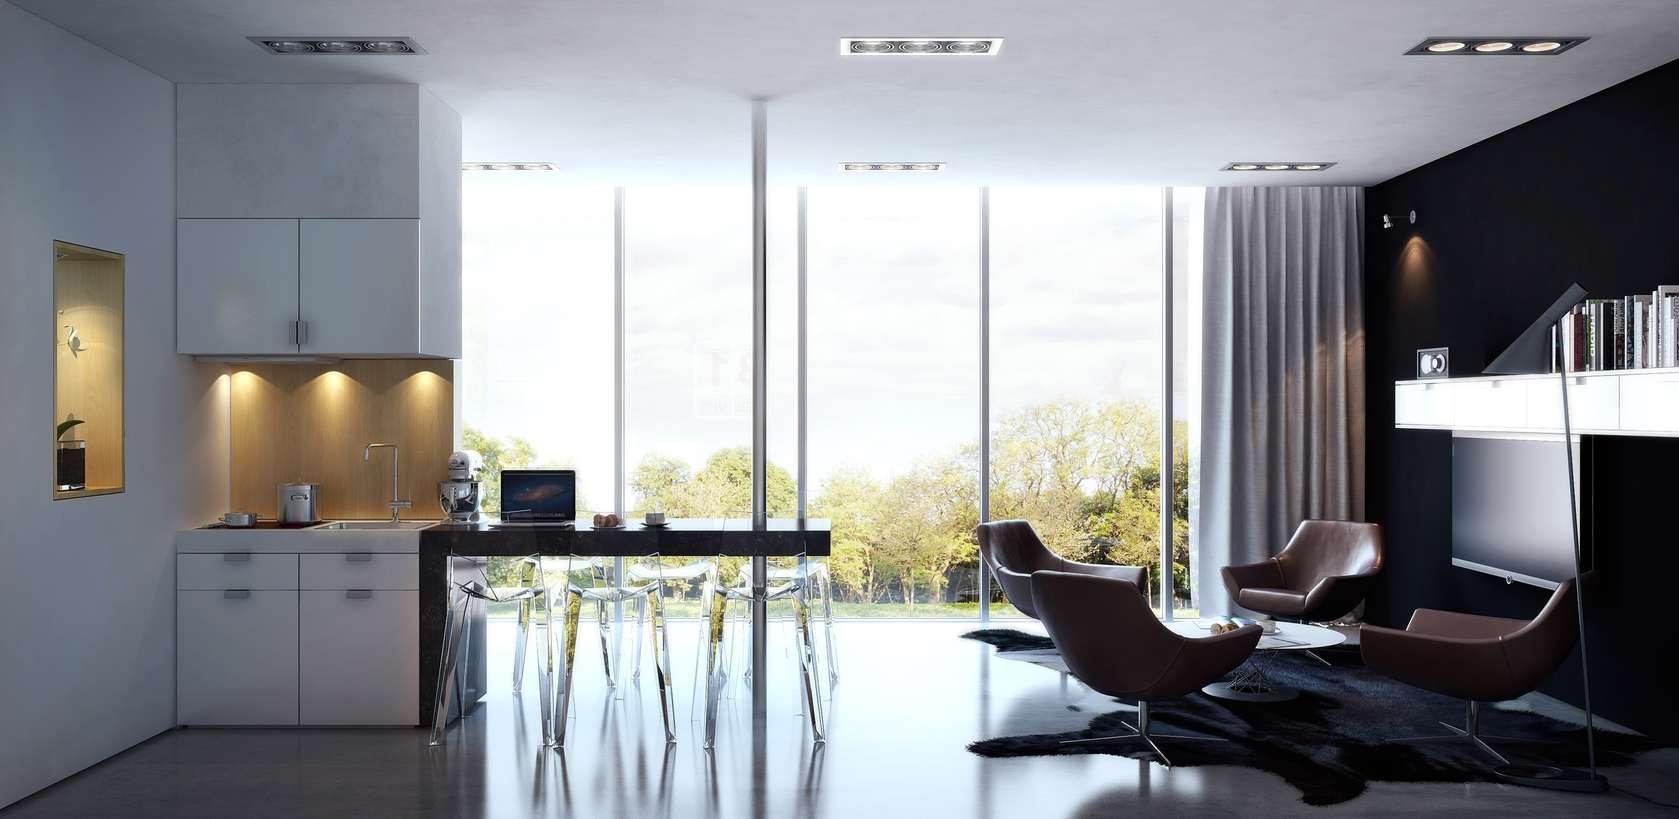 Small interior design concept 50m2 study architizer for Design apartment 50m2